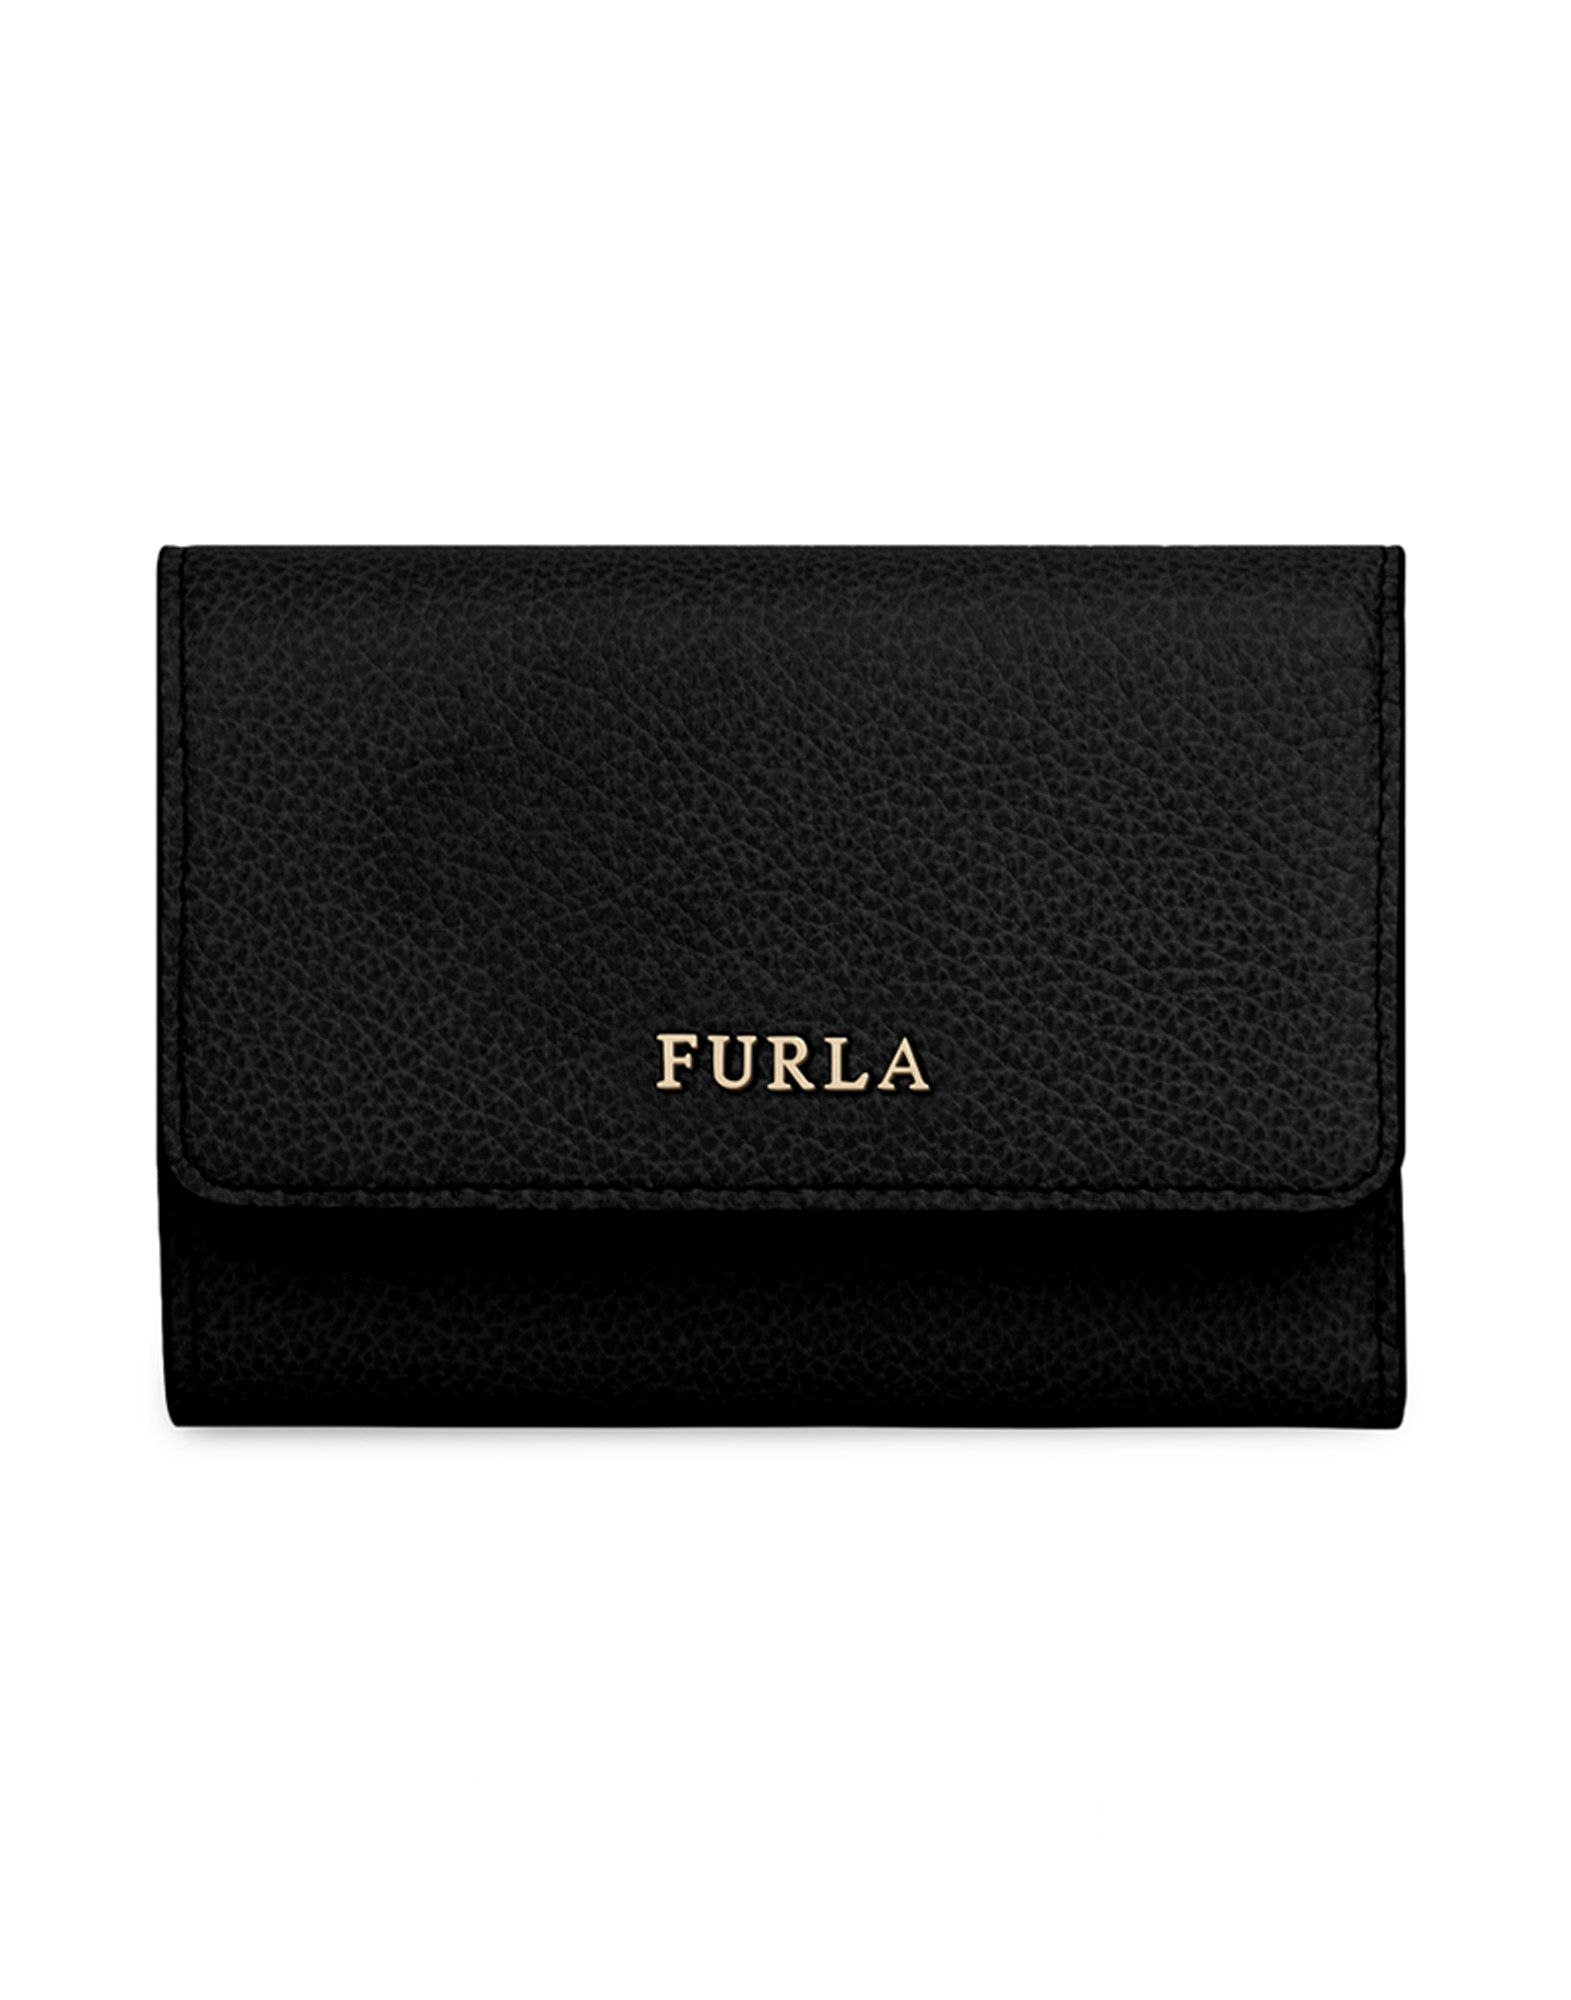 3b2a534d607e フルラ(FURLA) BABYLON 財布   通販・人気ランキング - 価格.com